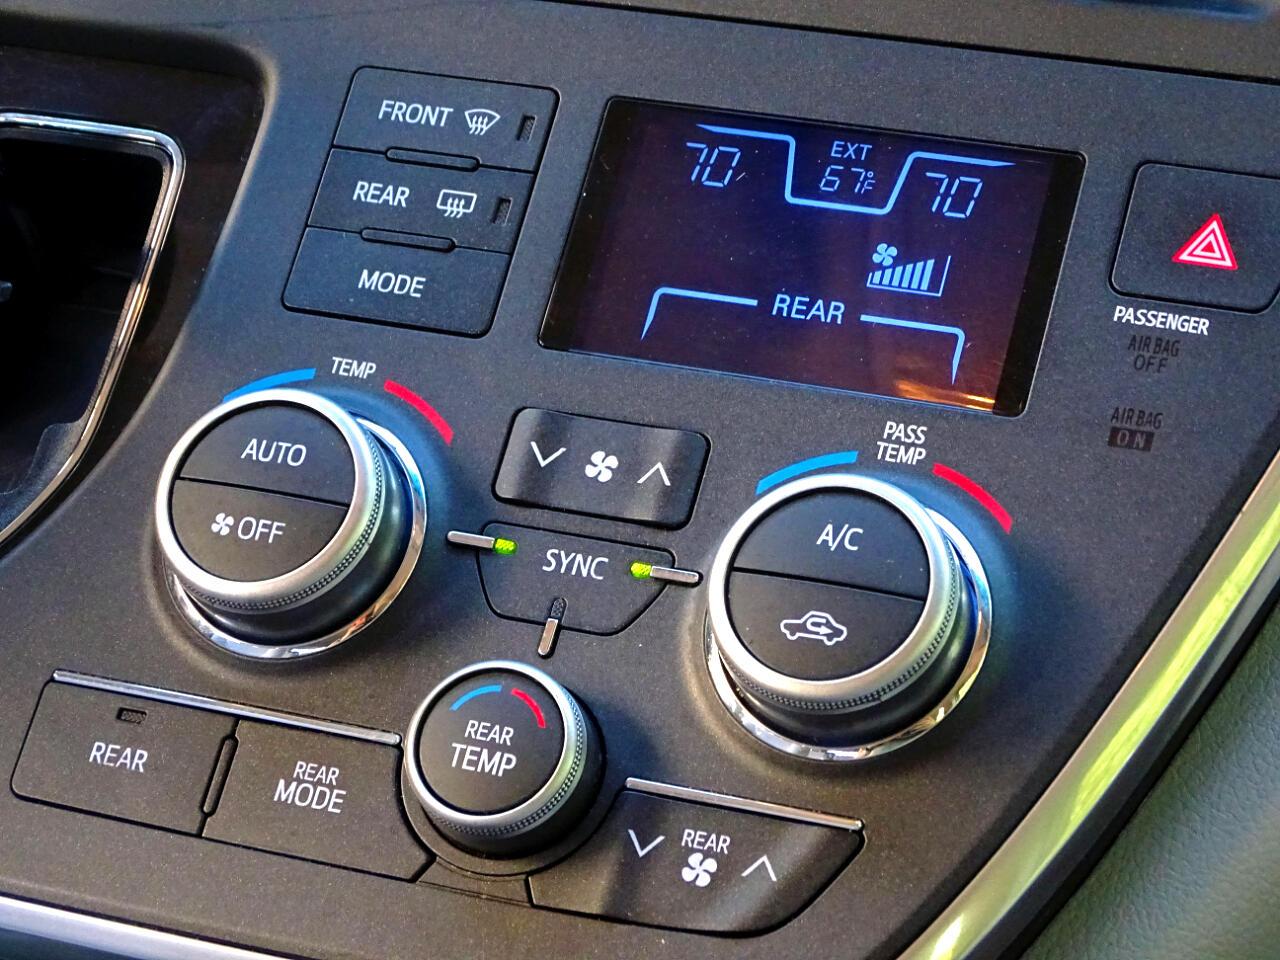 2016 Toyota Sienna 5dr 8-Pass Van LE FWD (Natl)